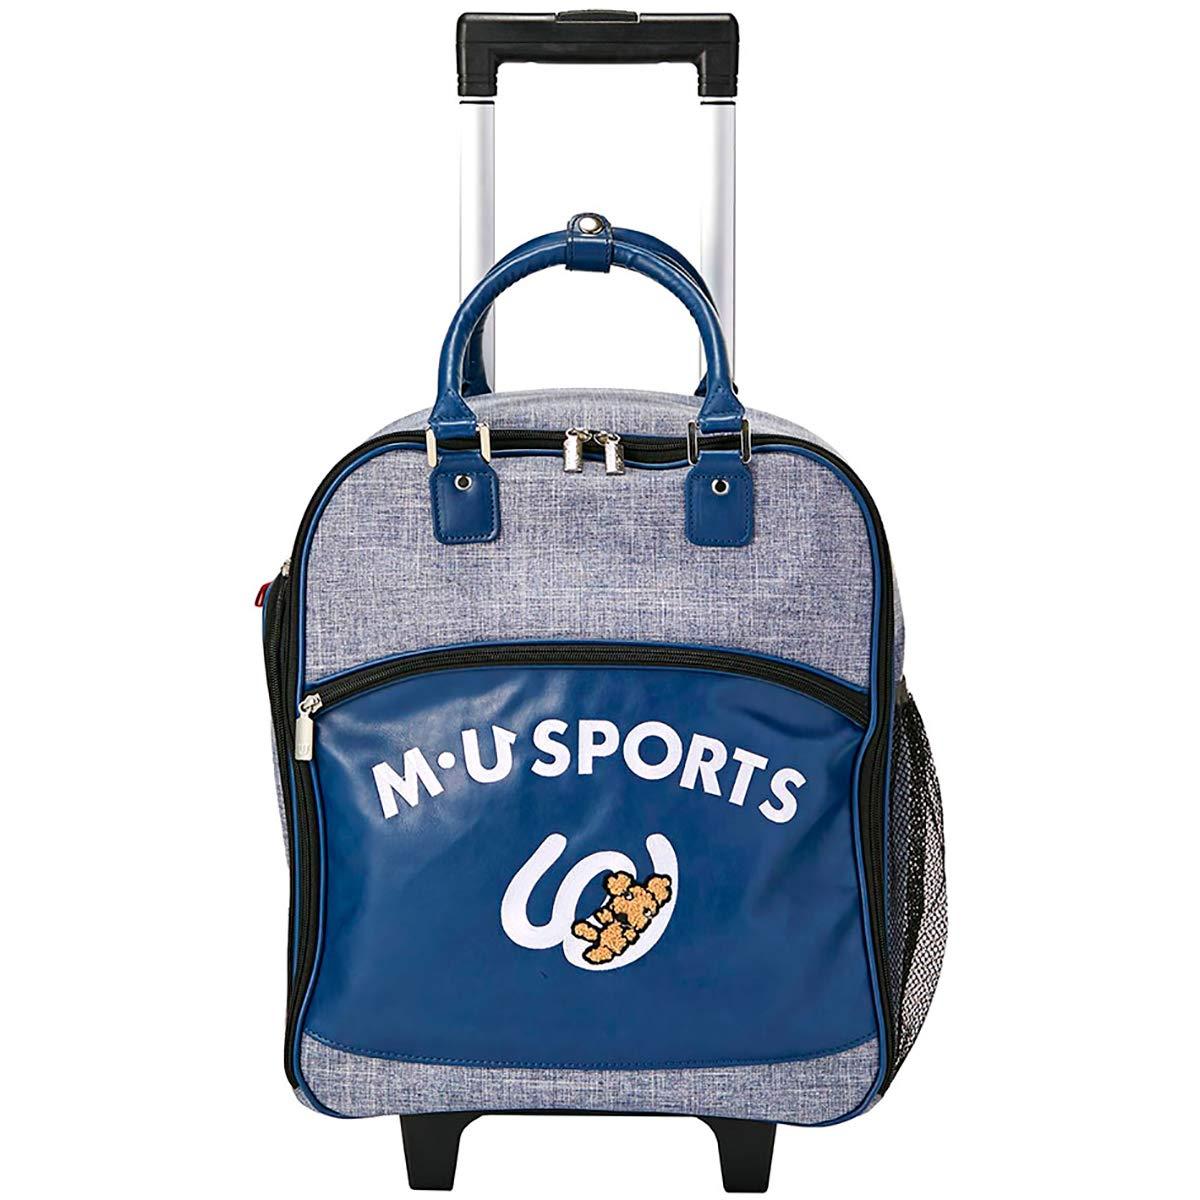 MU SPORTS(エム ユースポーツ) キャディーバッグ 2019SSシリーズ デニム風キャリーケース ブルー 703P2214 ブルー B07QTLSLJP